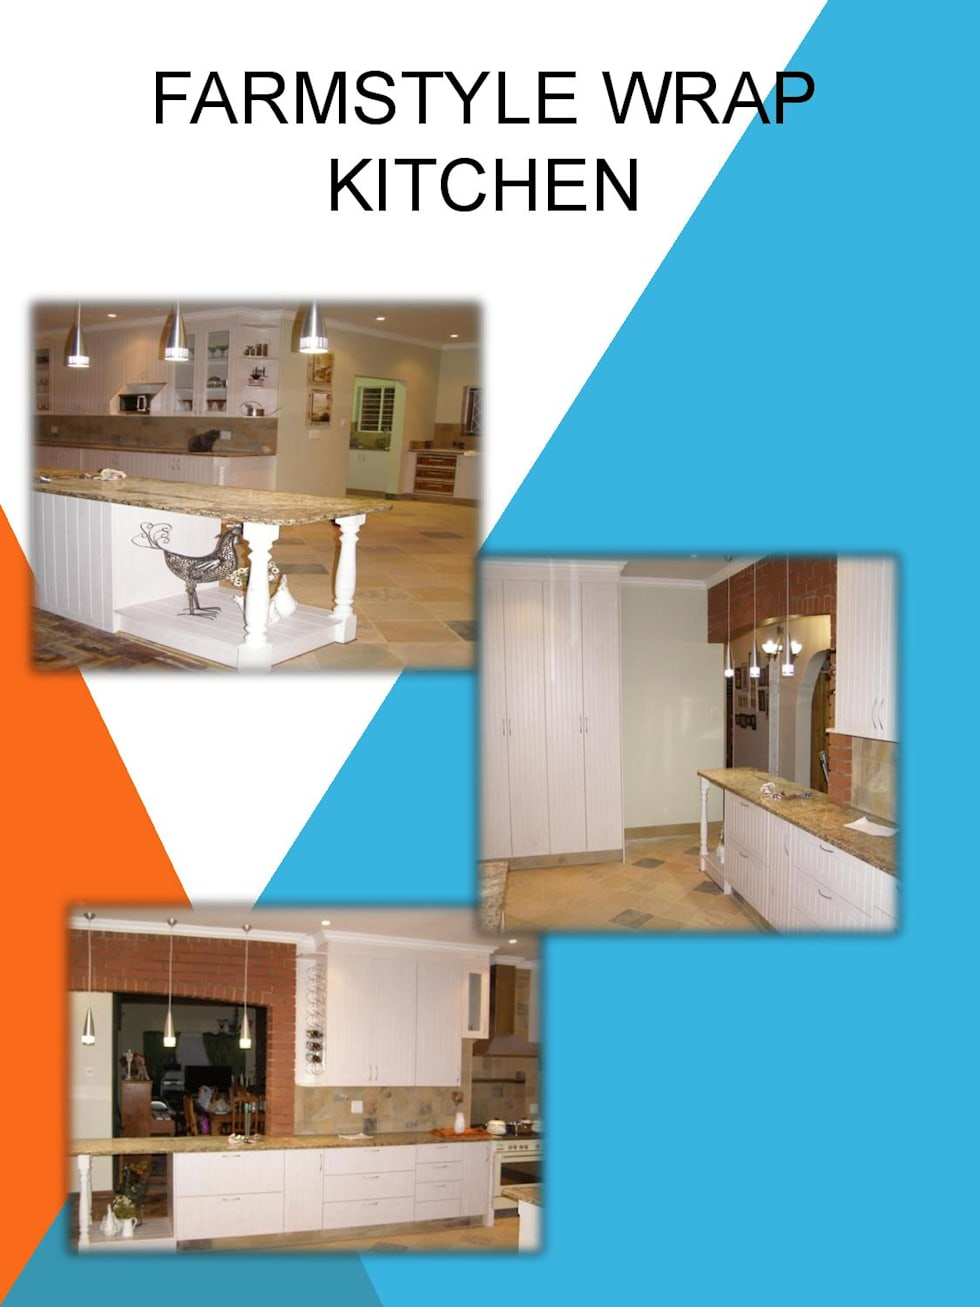 Farmstyle wrap kitchen:  Kitchen units by SCD Kitchens